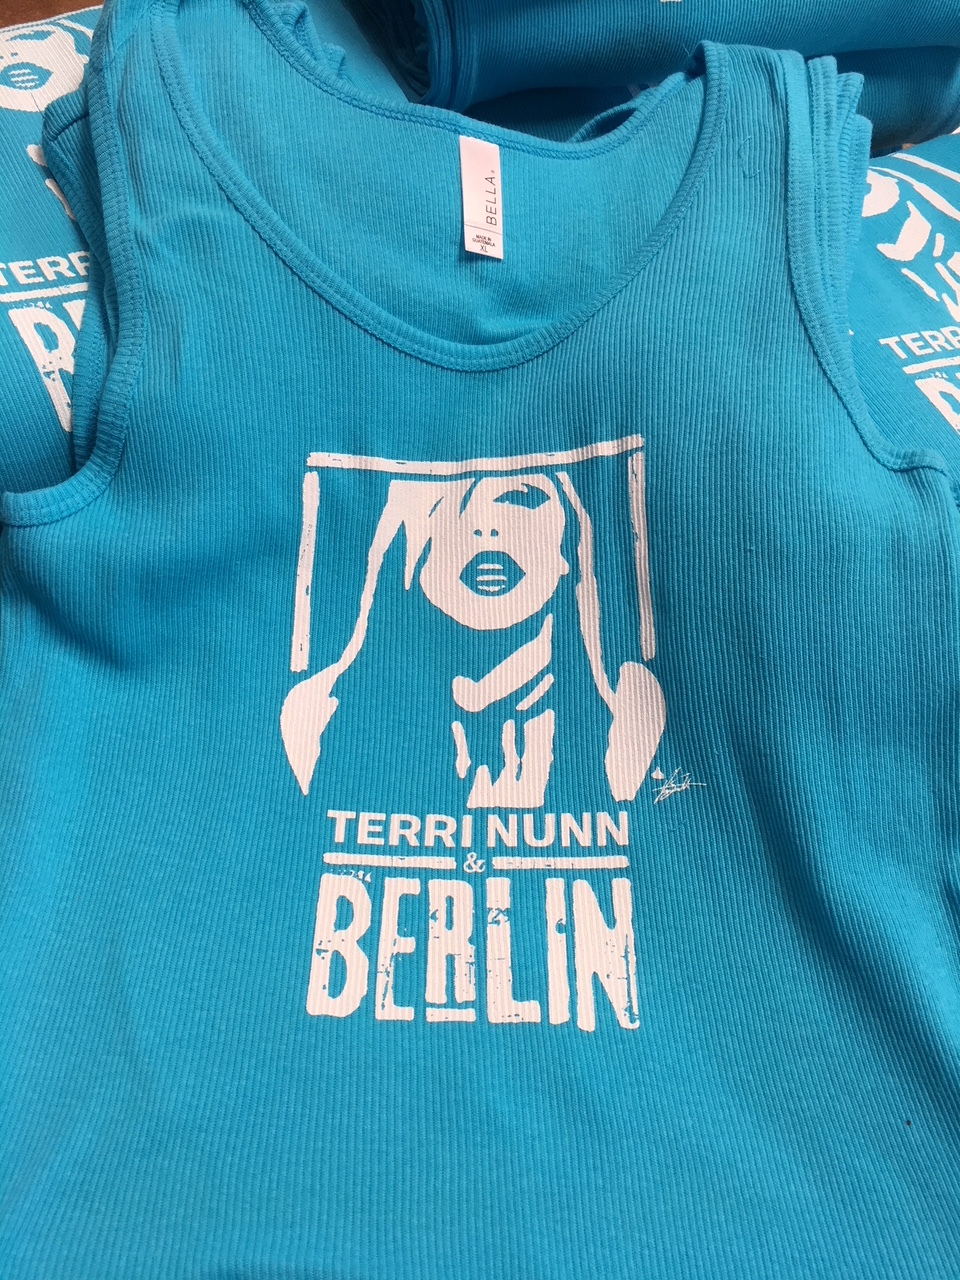 TERRI NUNN / BERLIN